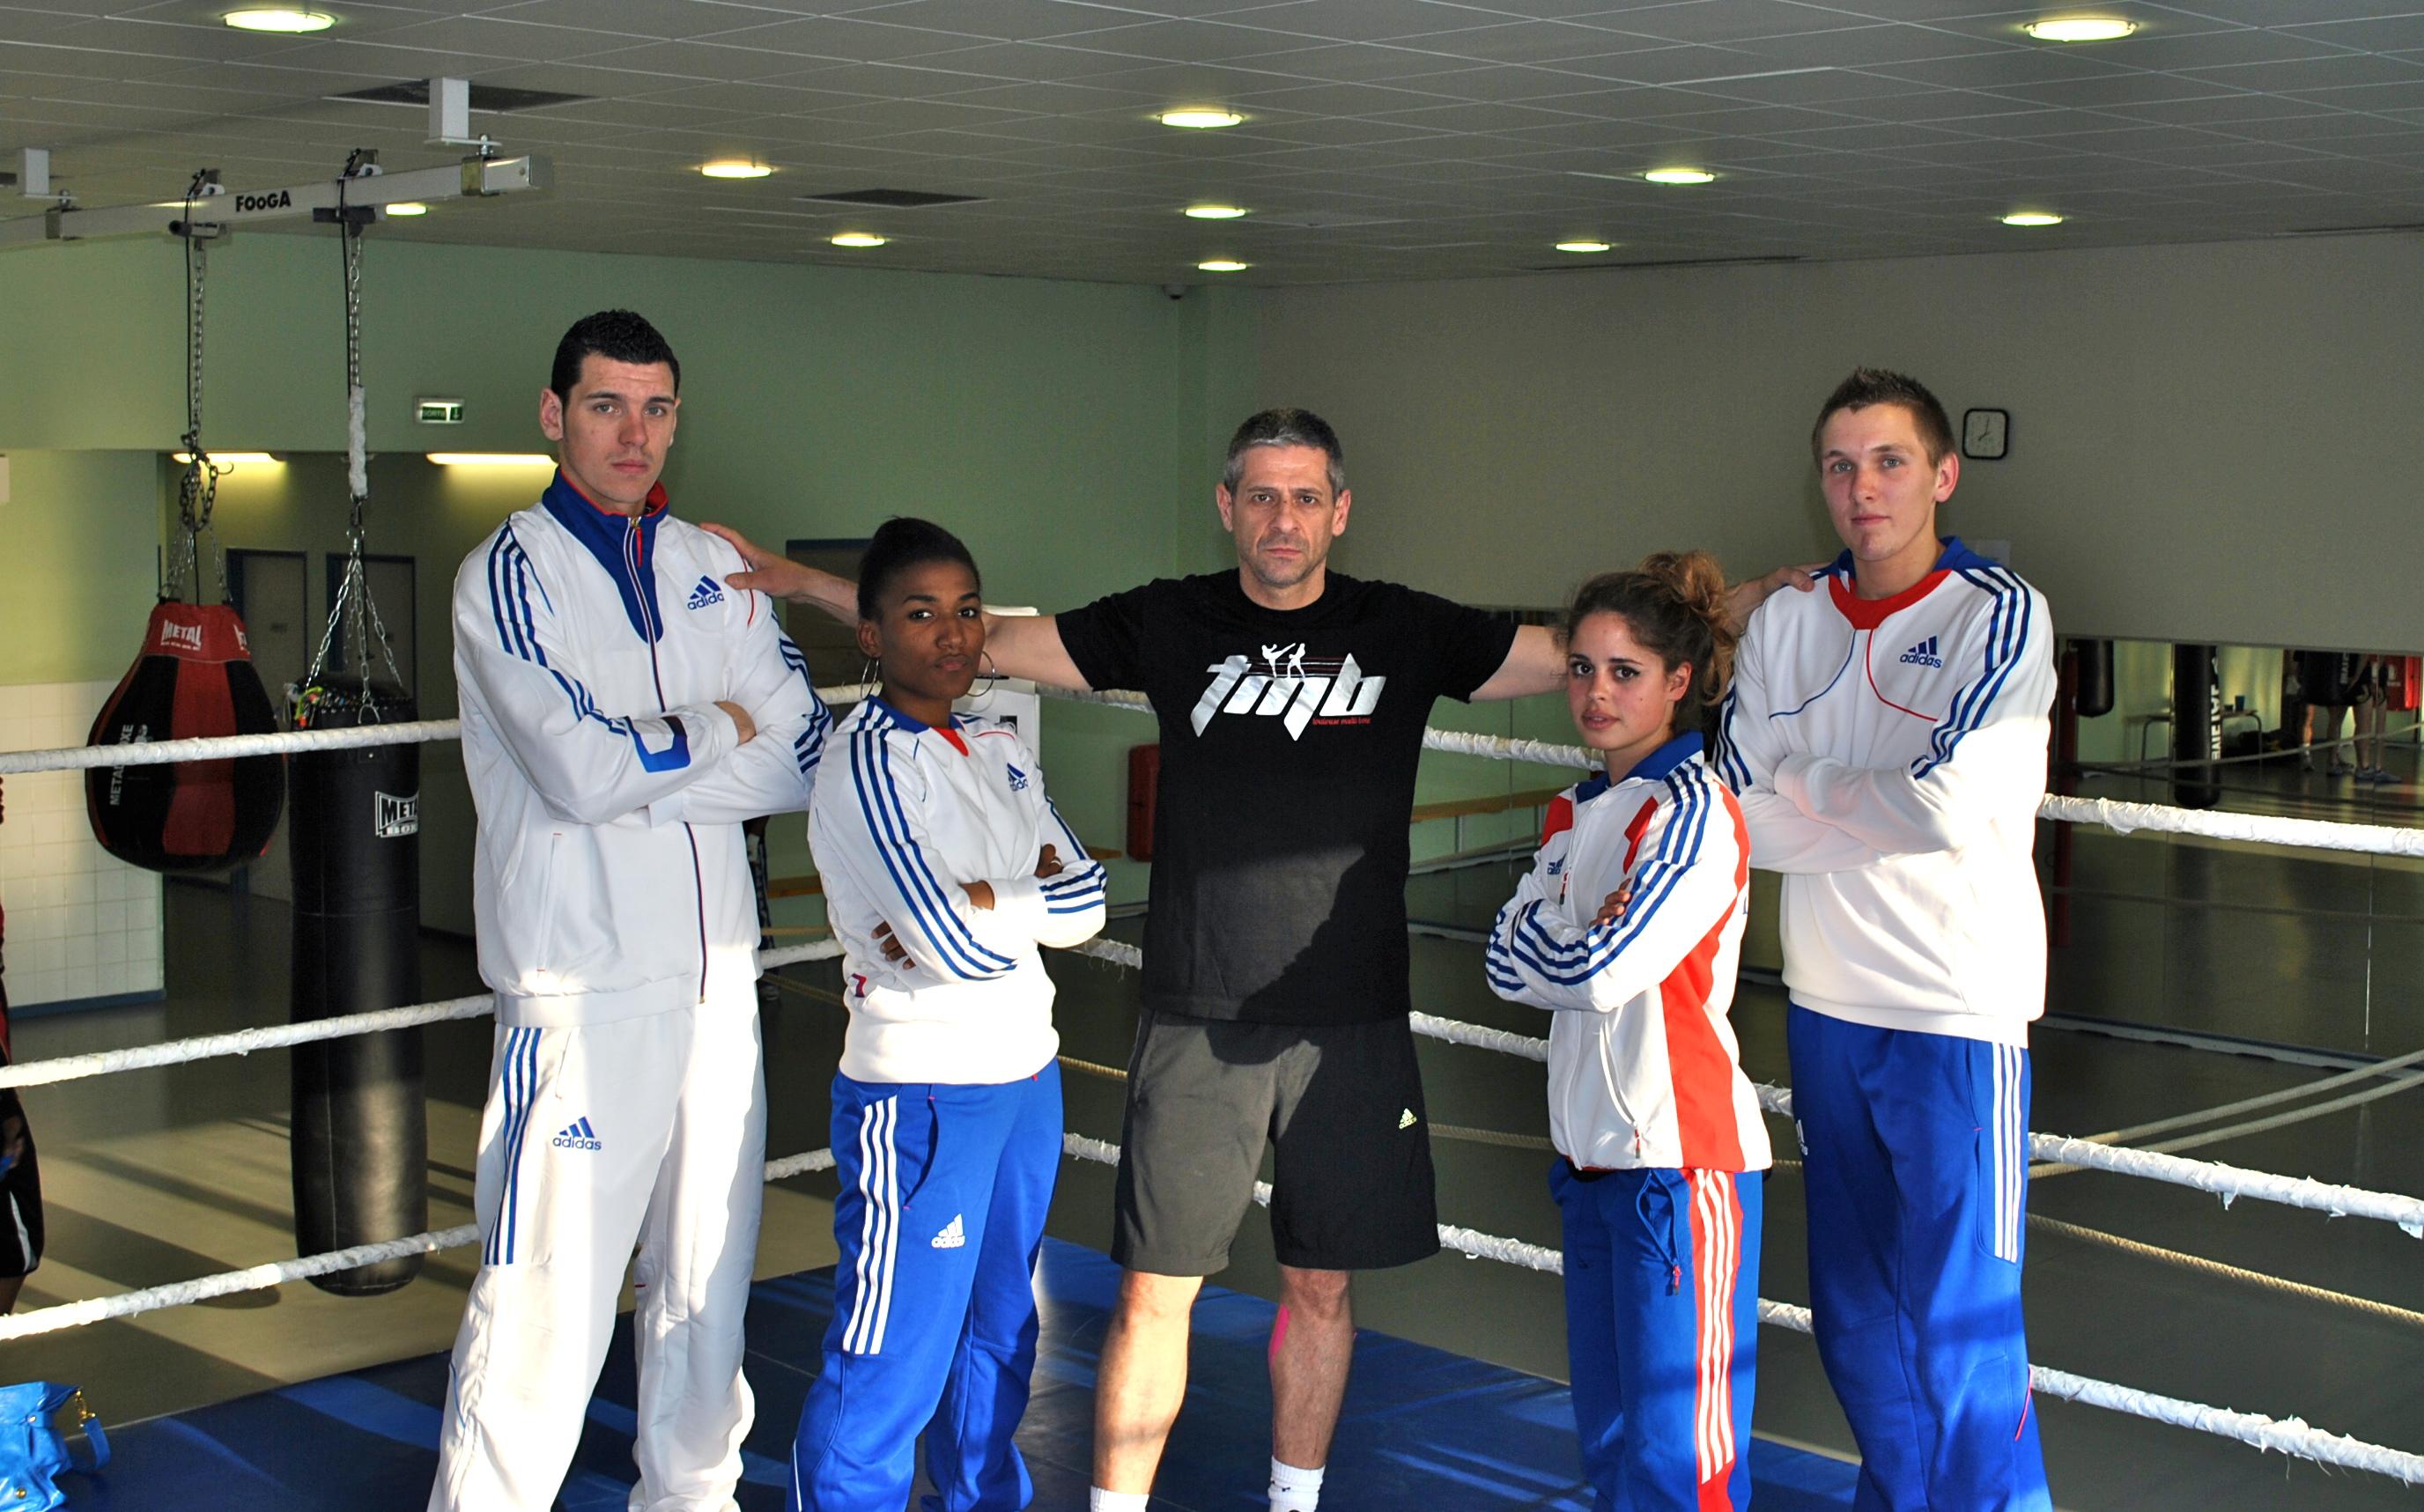 Les membres de l'équipe de France